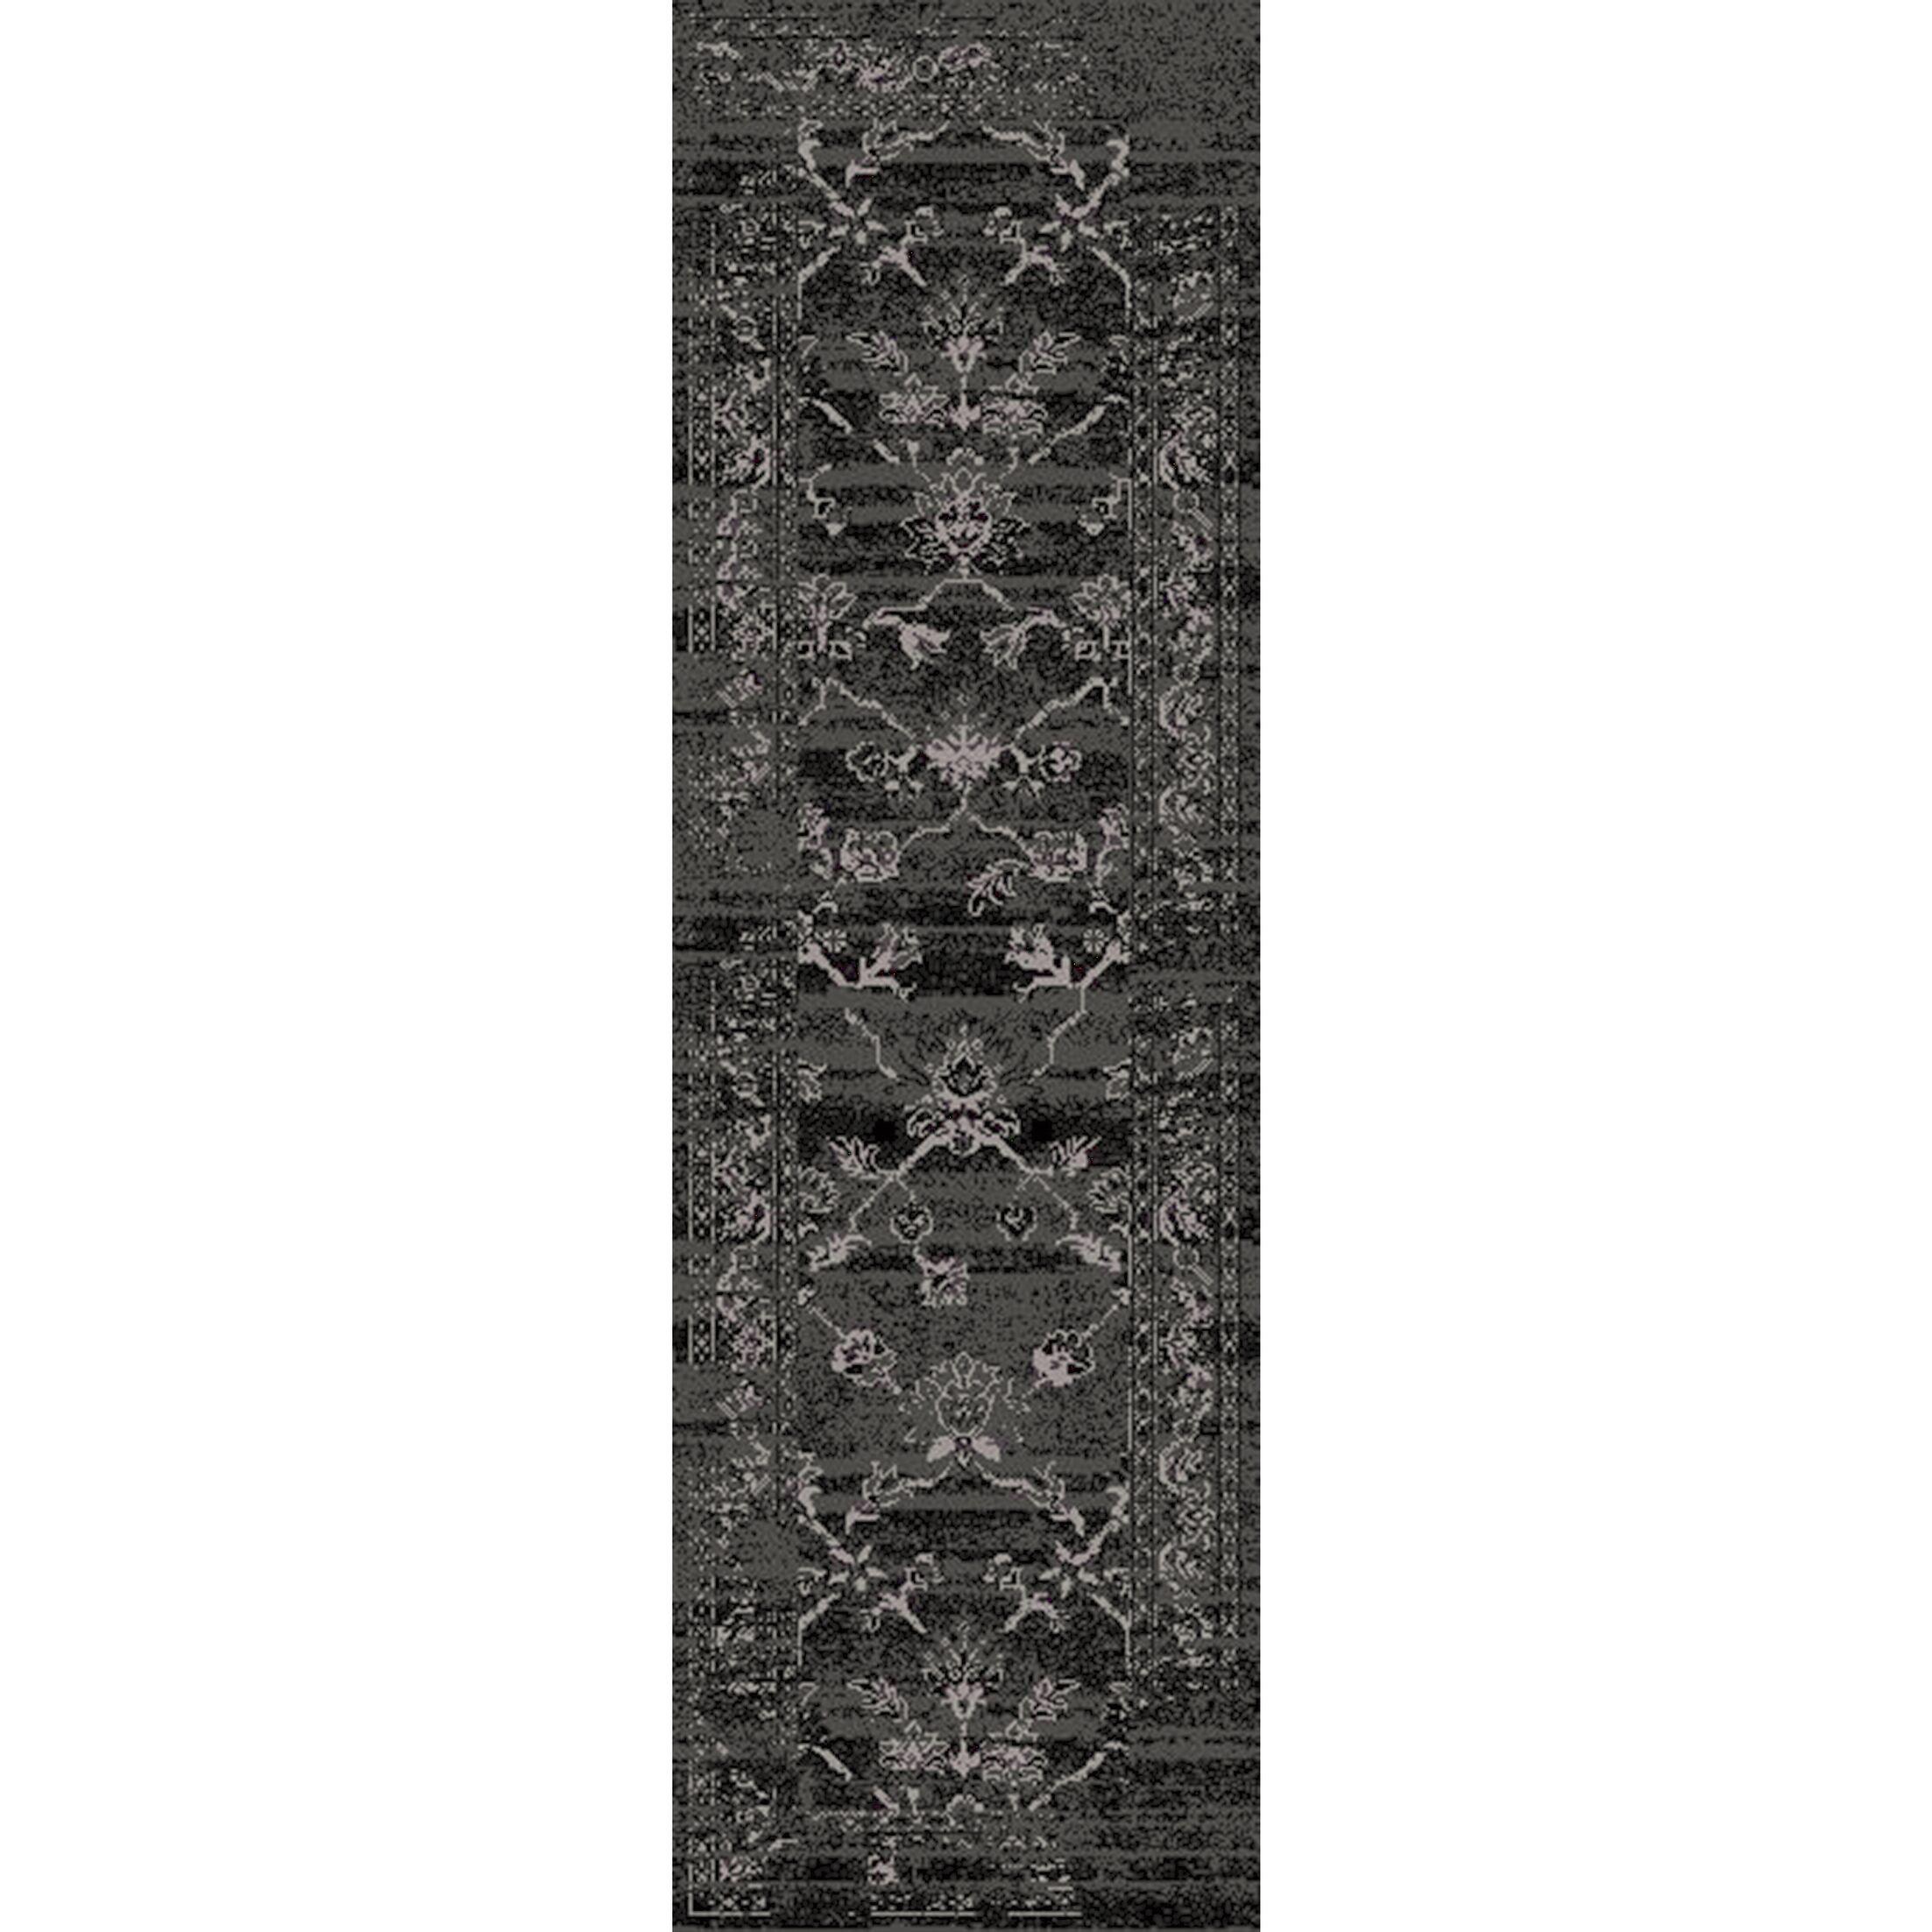 Kulpmont Black/Light Gray Area Rug Rug Size: Rectangle 8'10